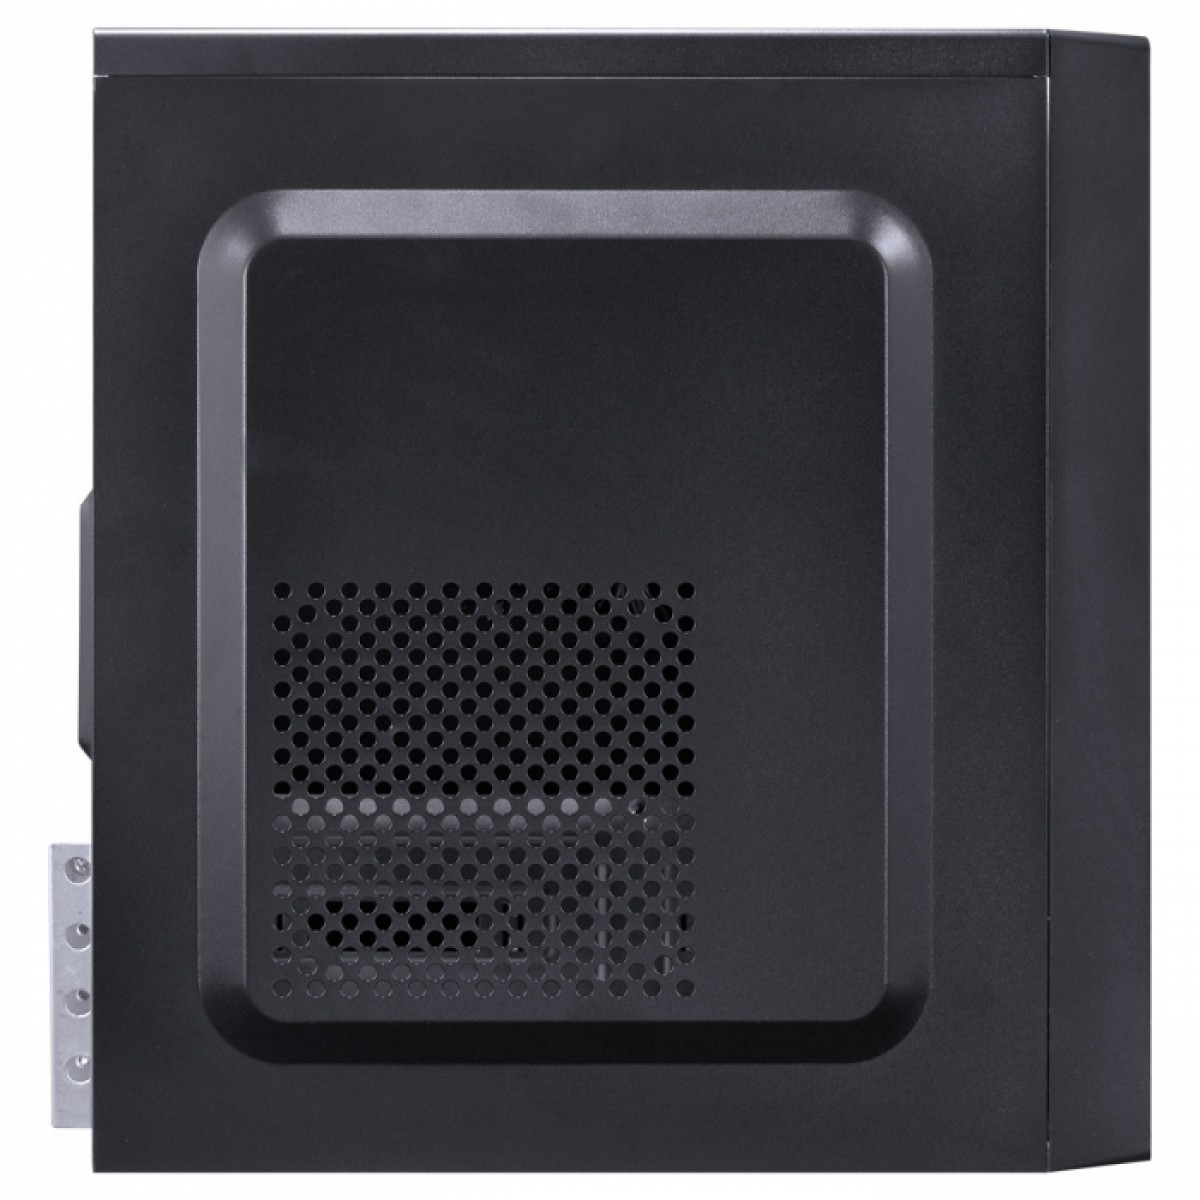 Computador Skul T-Home H200 PENTIUM DUAL CORE G6400 / 8GB DDR4 / SSD 240GB / HDMI/VGA / FONTE 200W